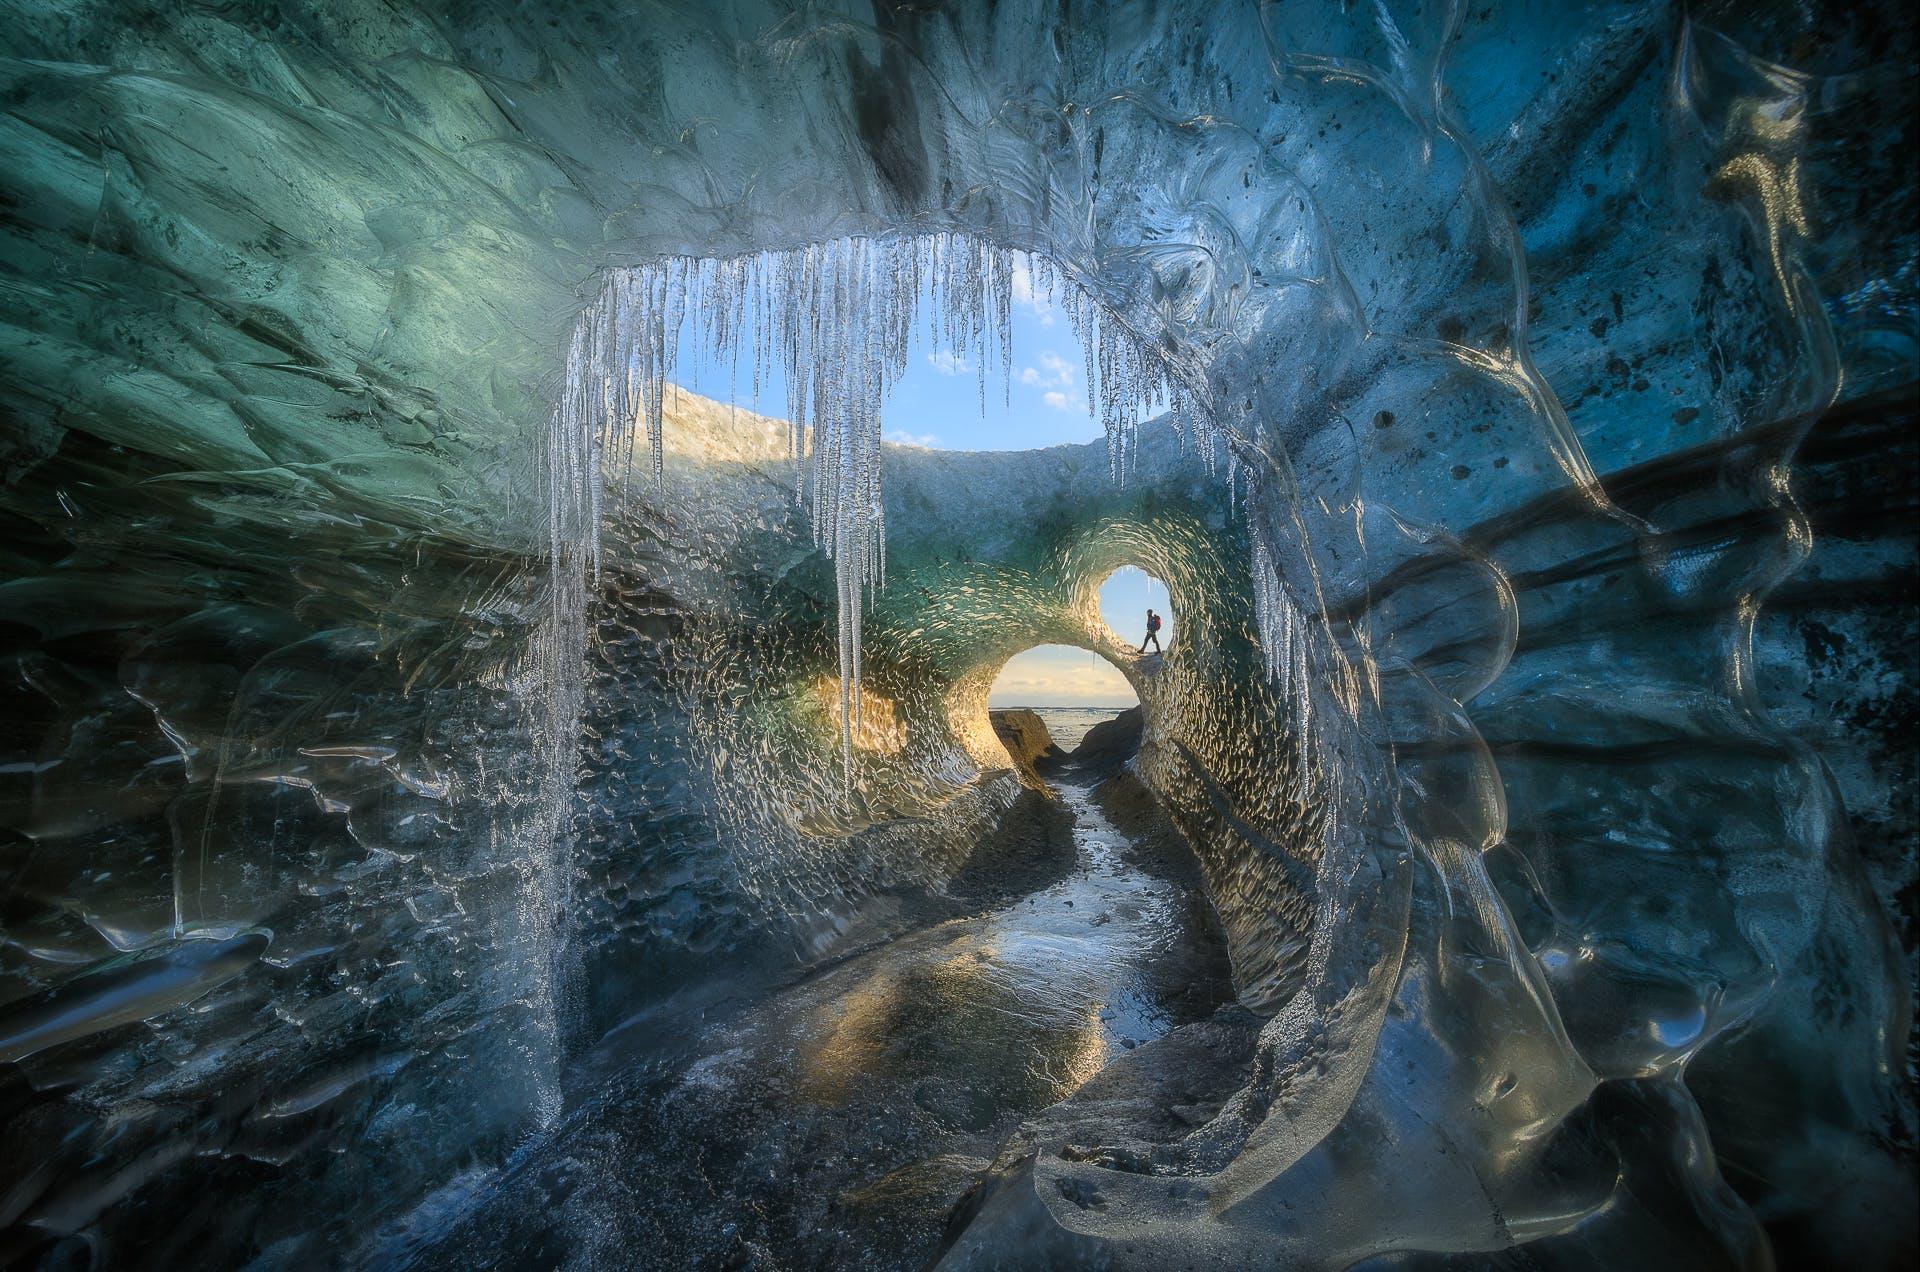 iceland photo tours08.jpg